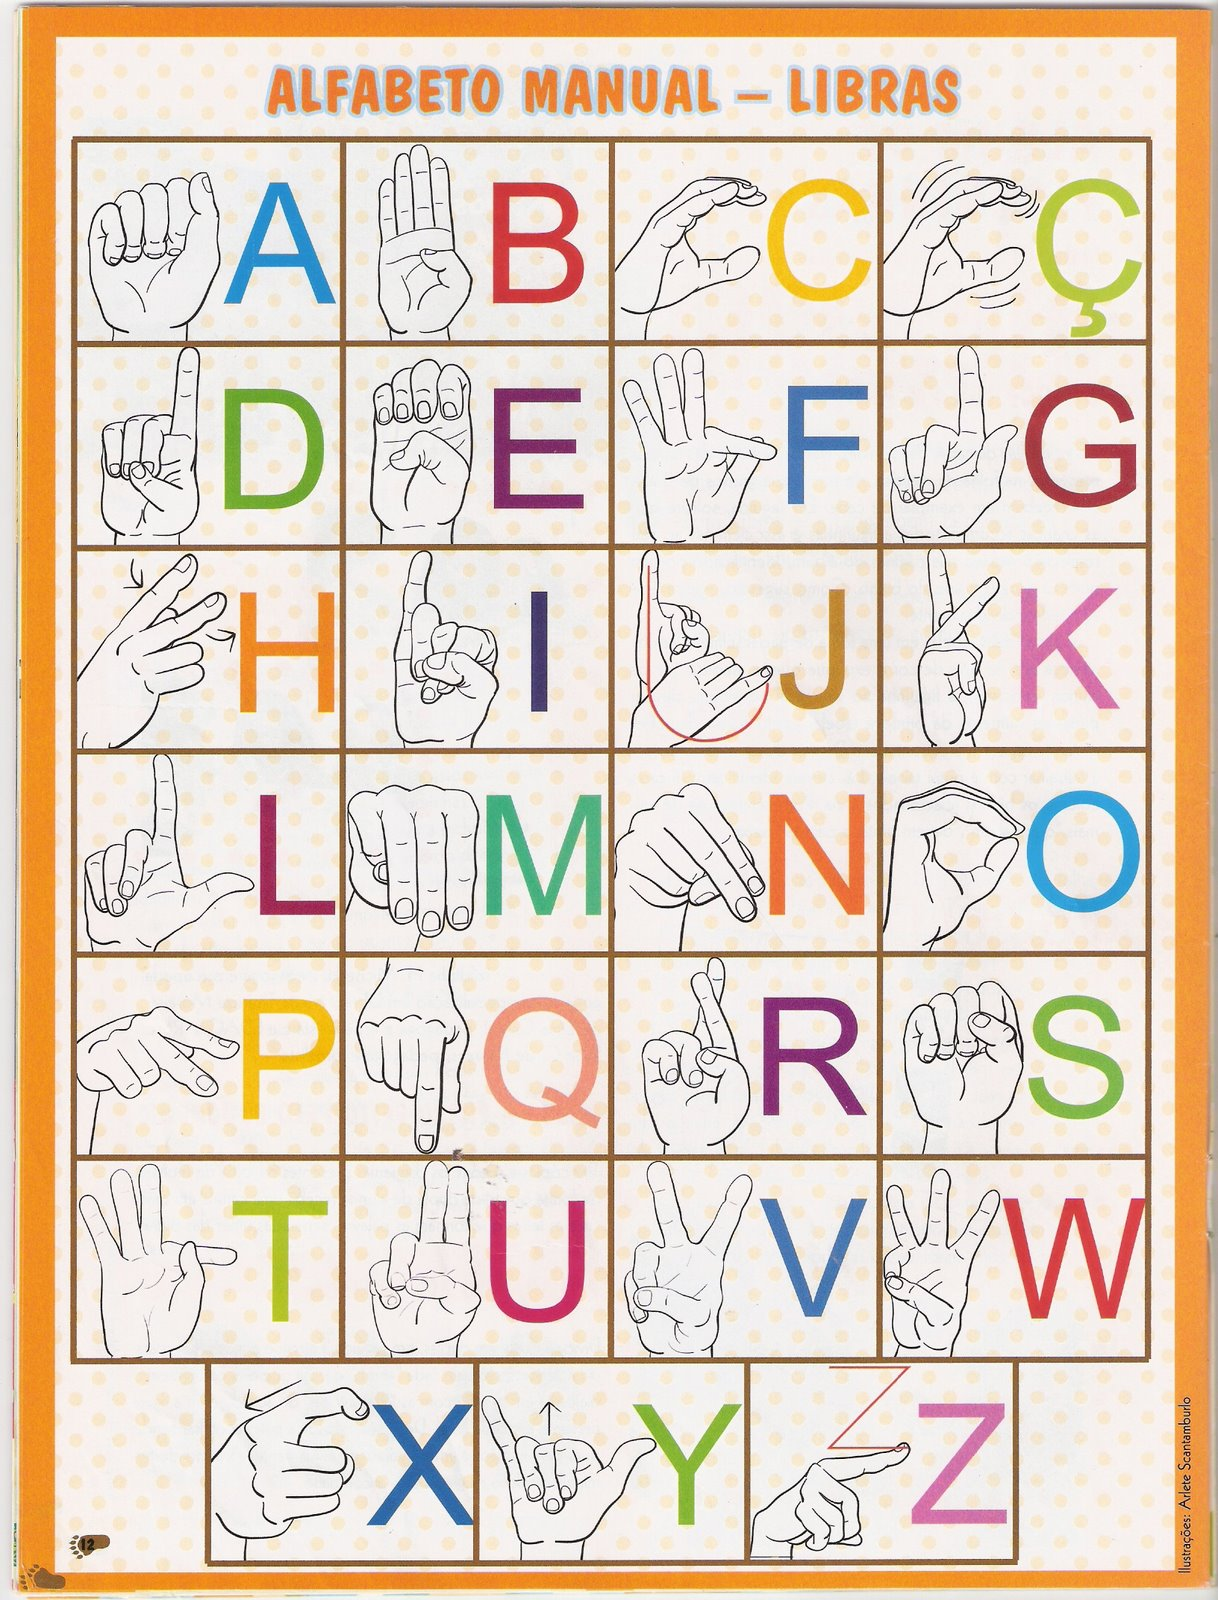 Arte de Educar Com Amor: Alfabeto Manual Libras #BA6711 1218 1600